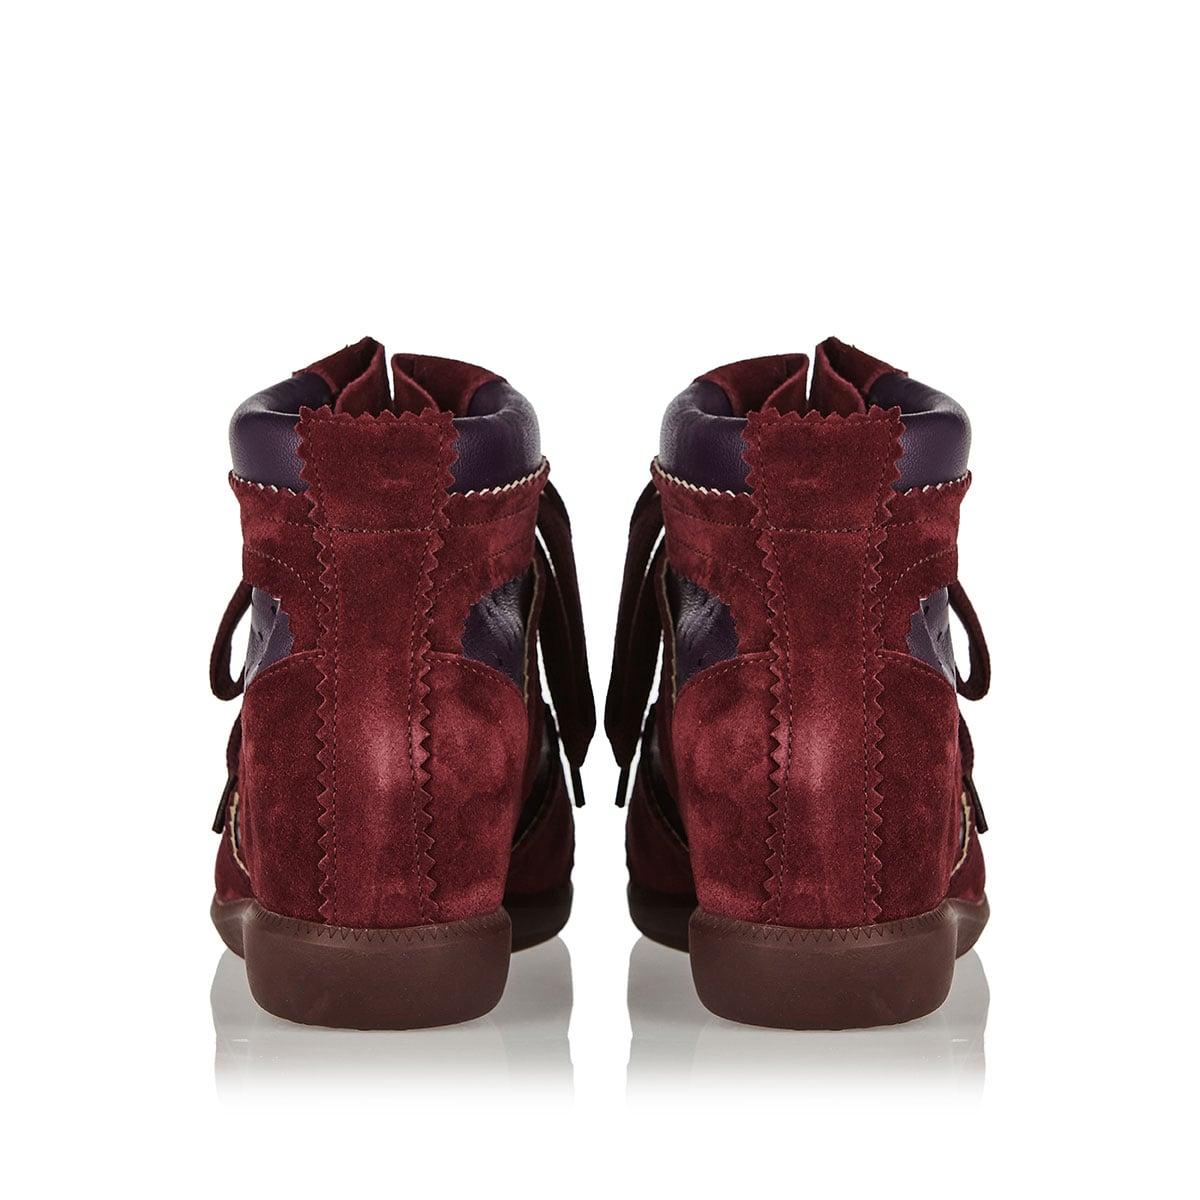 Bobby suede wedge sneakers